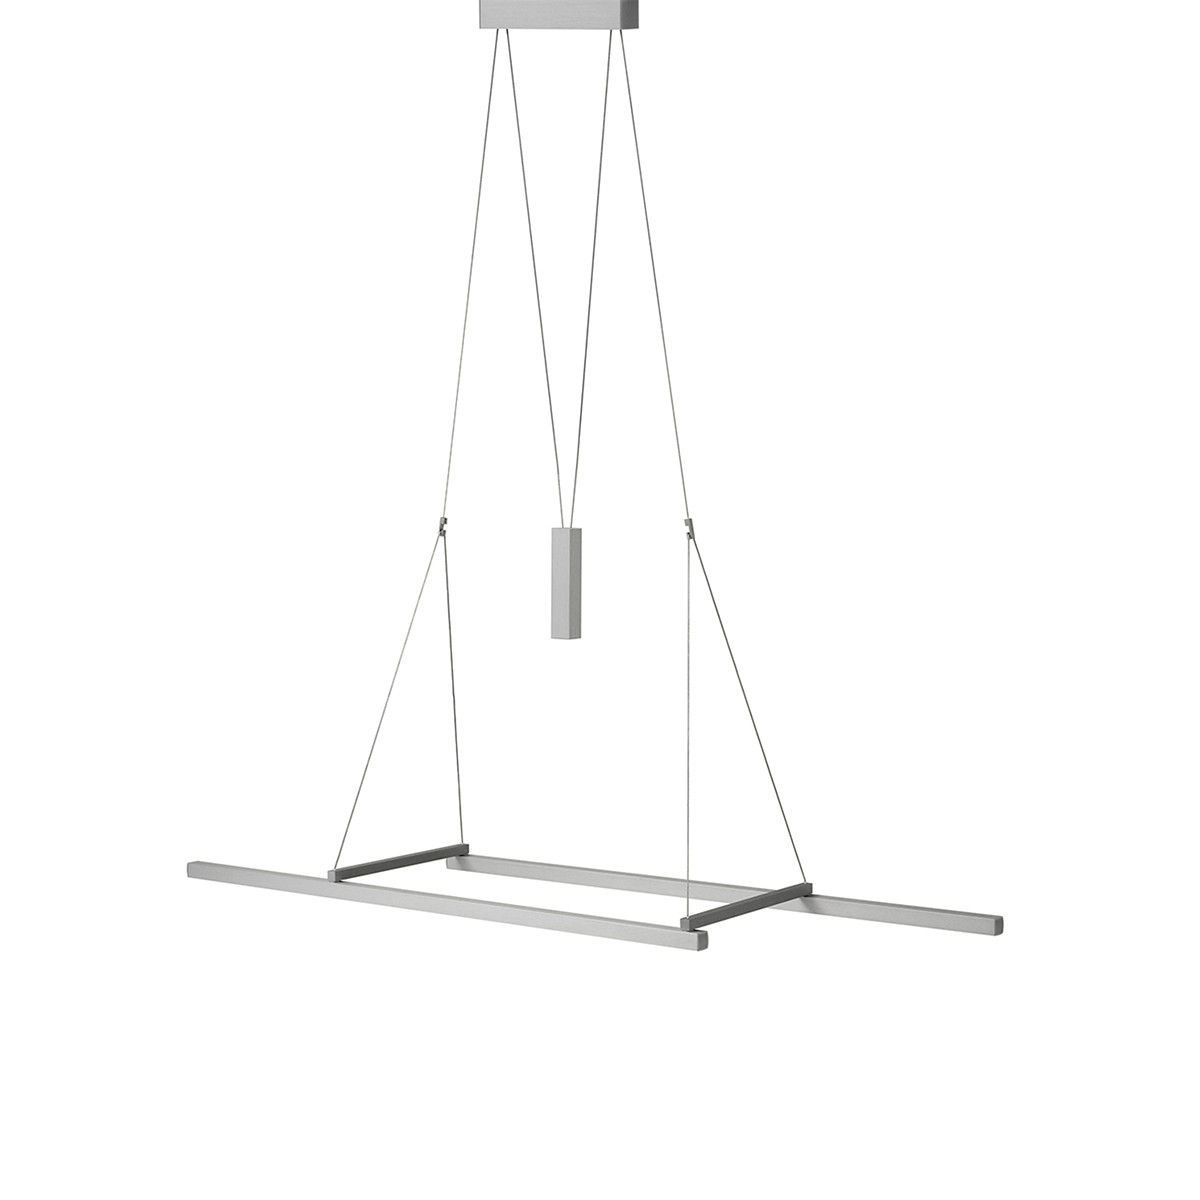 Byok Squadra Pendelleuchte, Länge: 75 cm, Aluminium matt